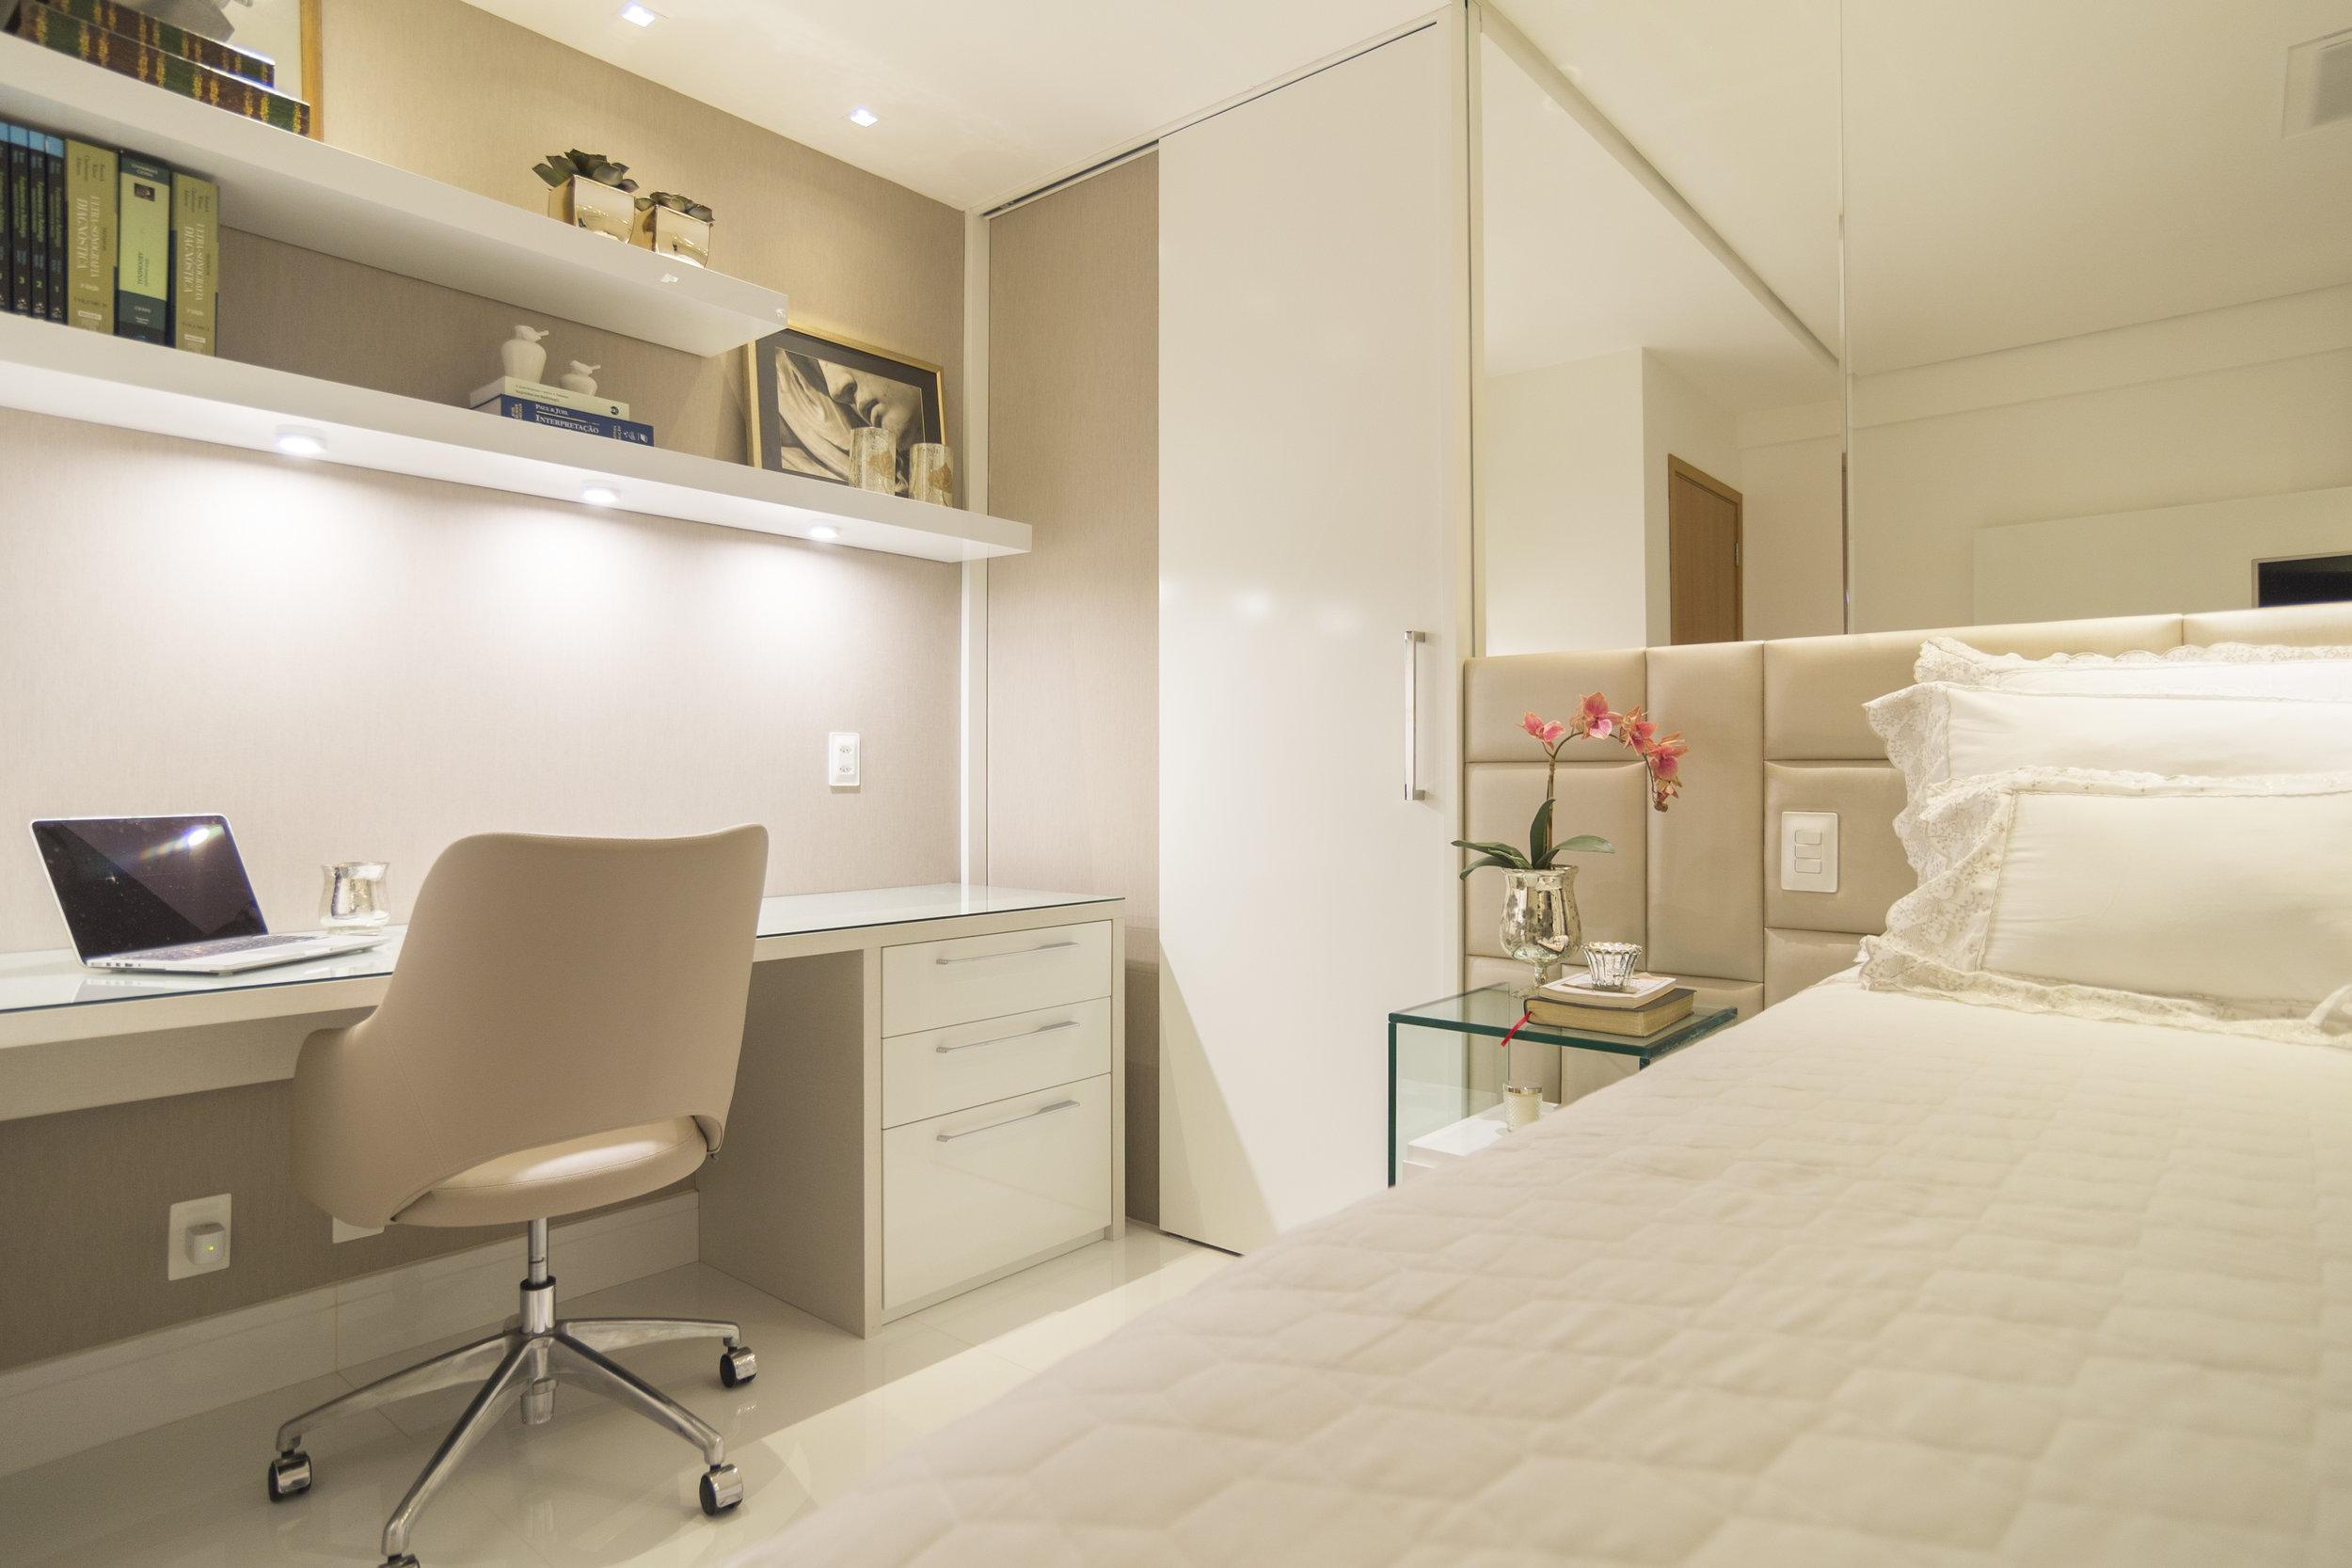 projeto-arquitetonico-robertoindira-duo-arquitetura-apartamentos-quarto-03.jpg